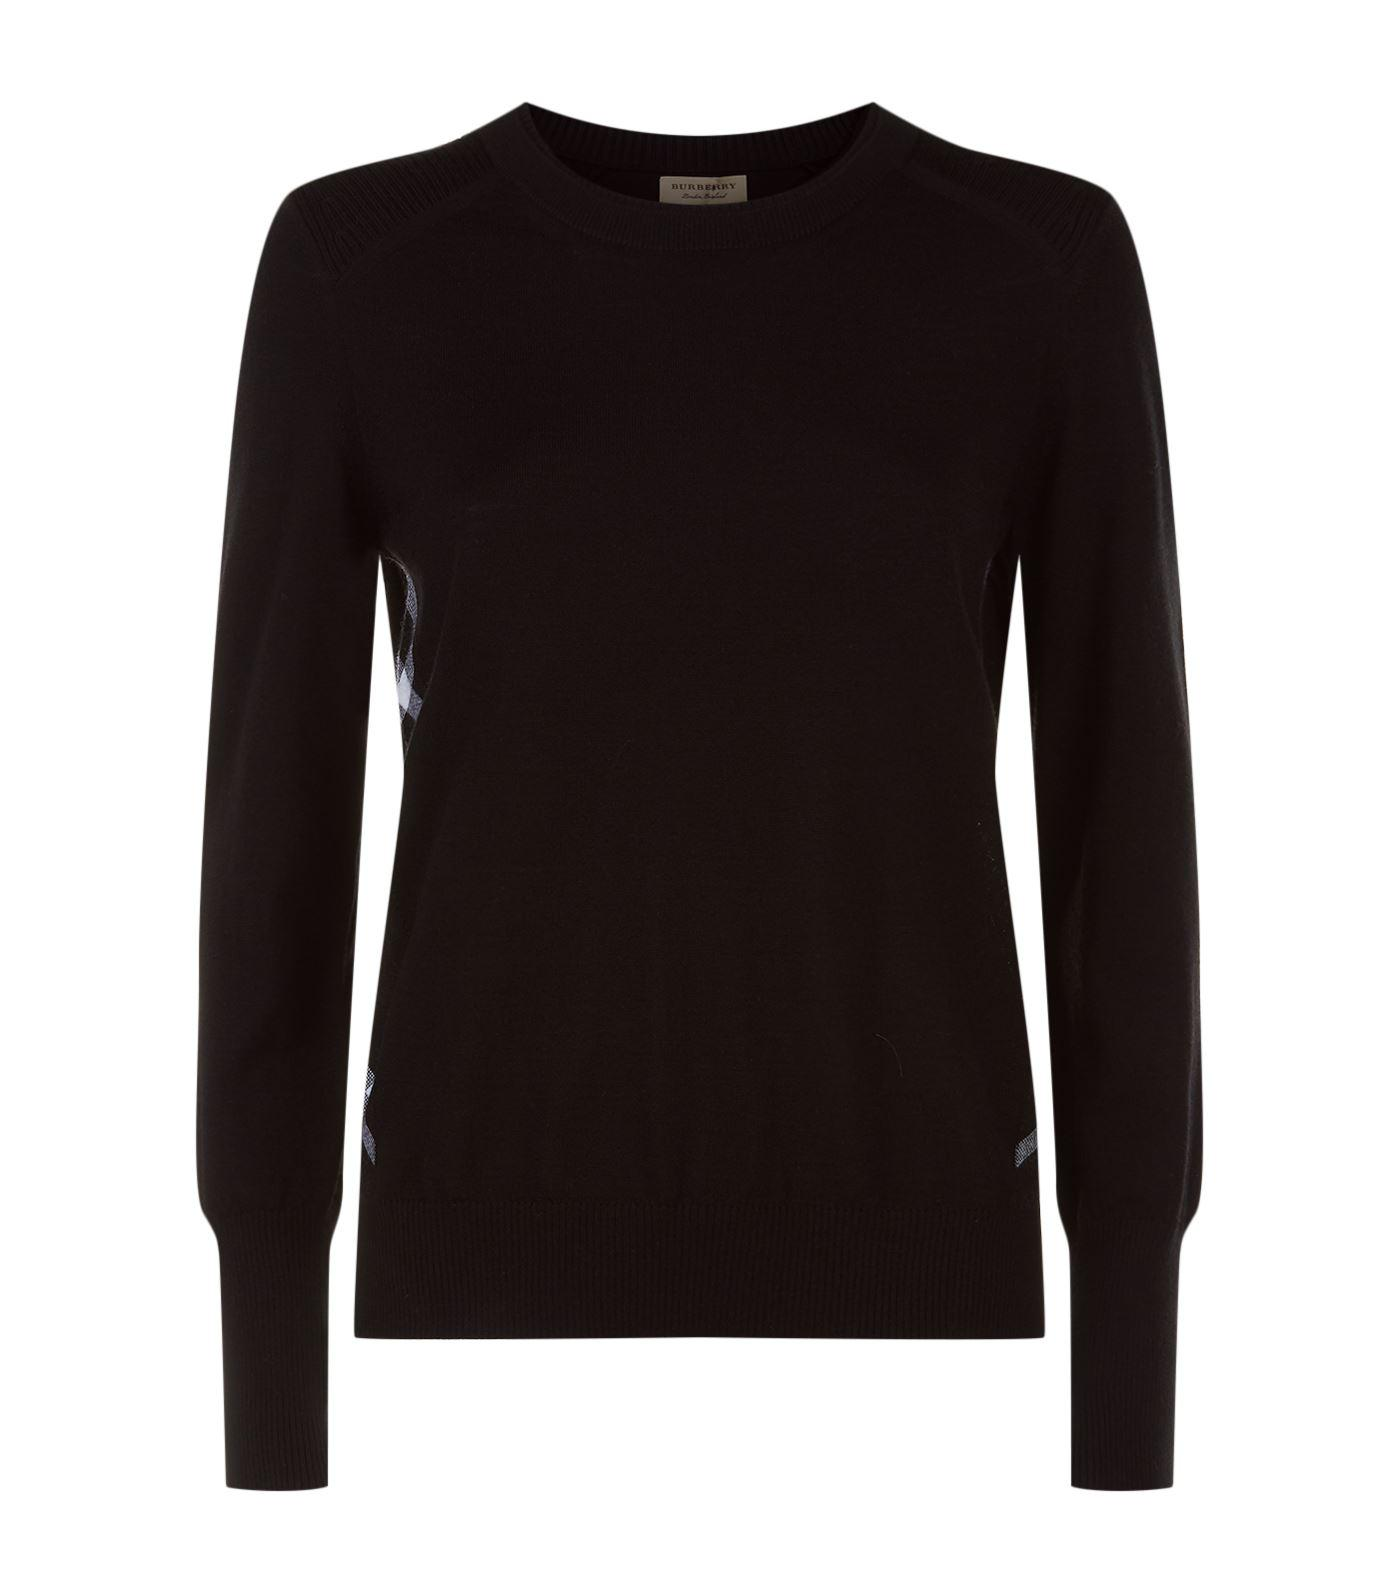 Burberry Meigan Long-sleeve Crewneck Check-side Sweater, Black